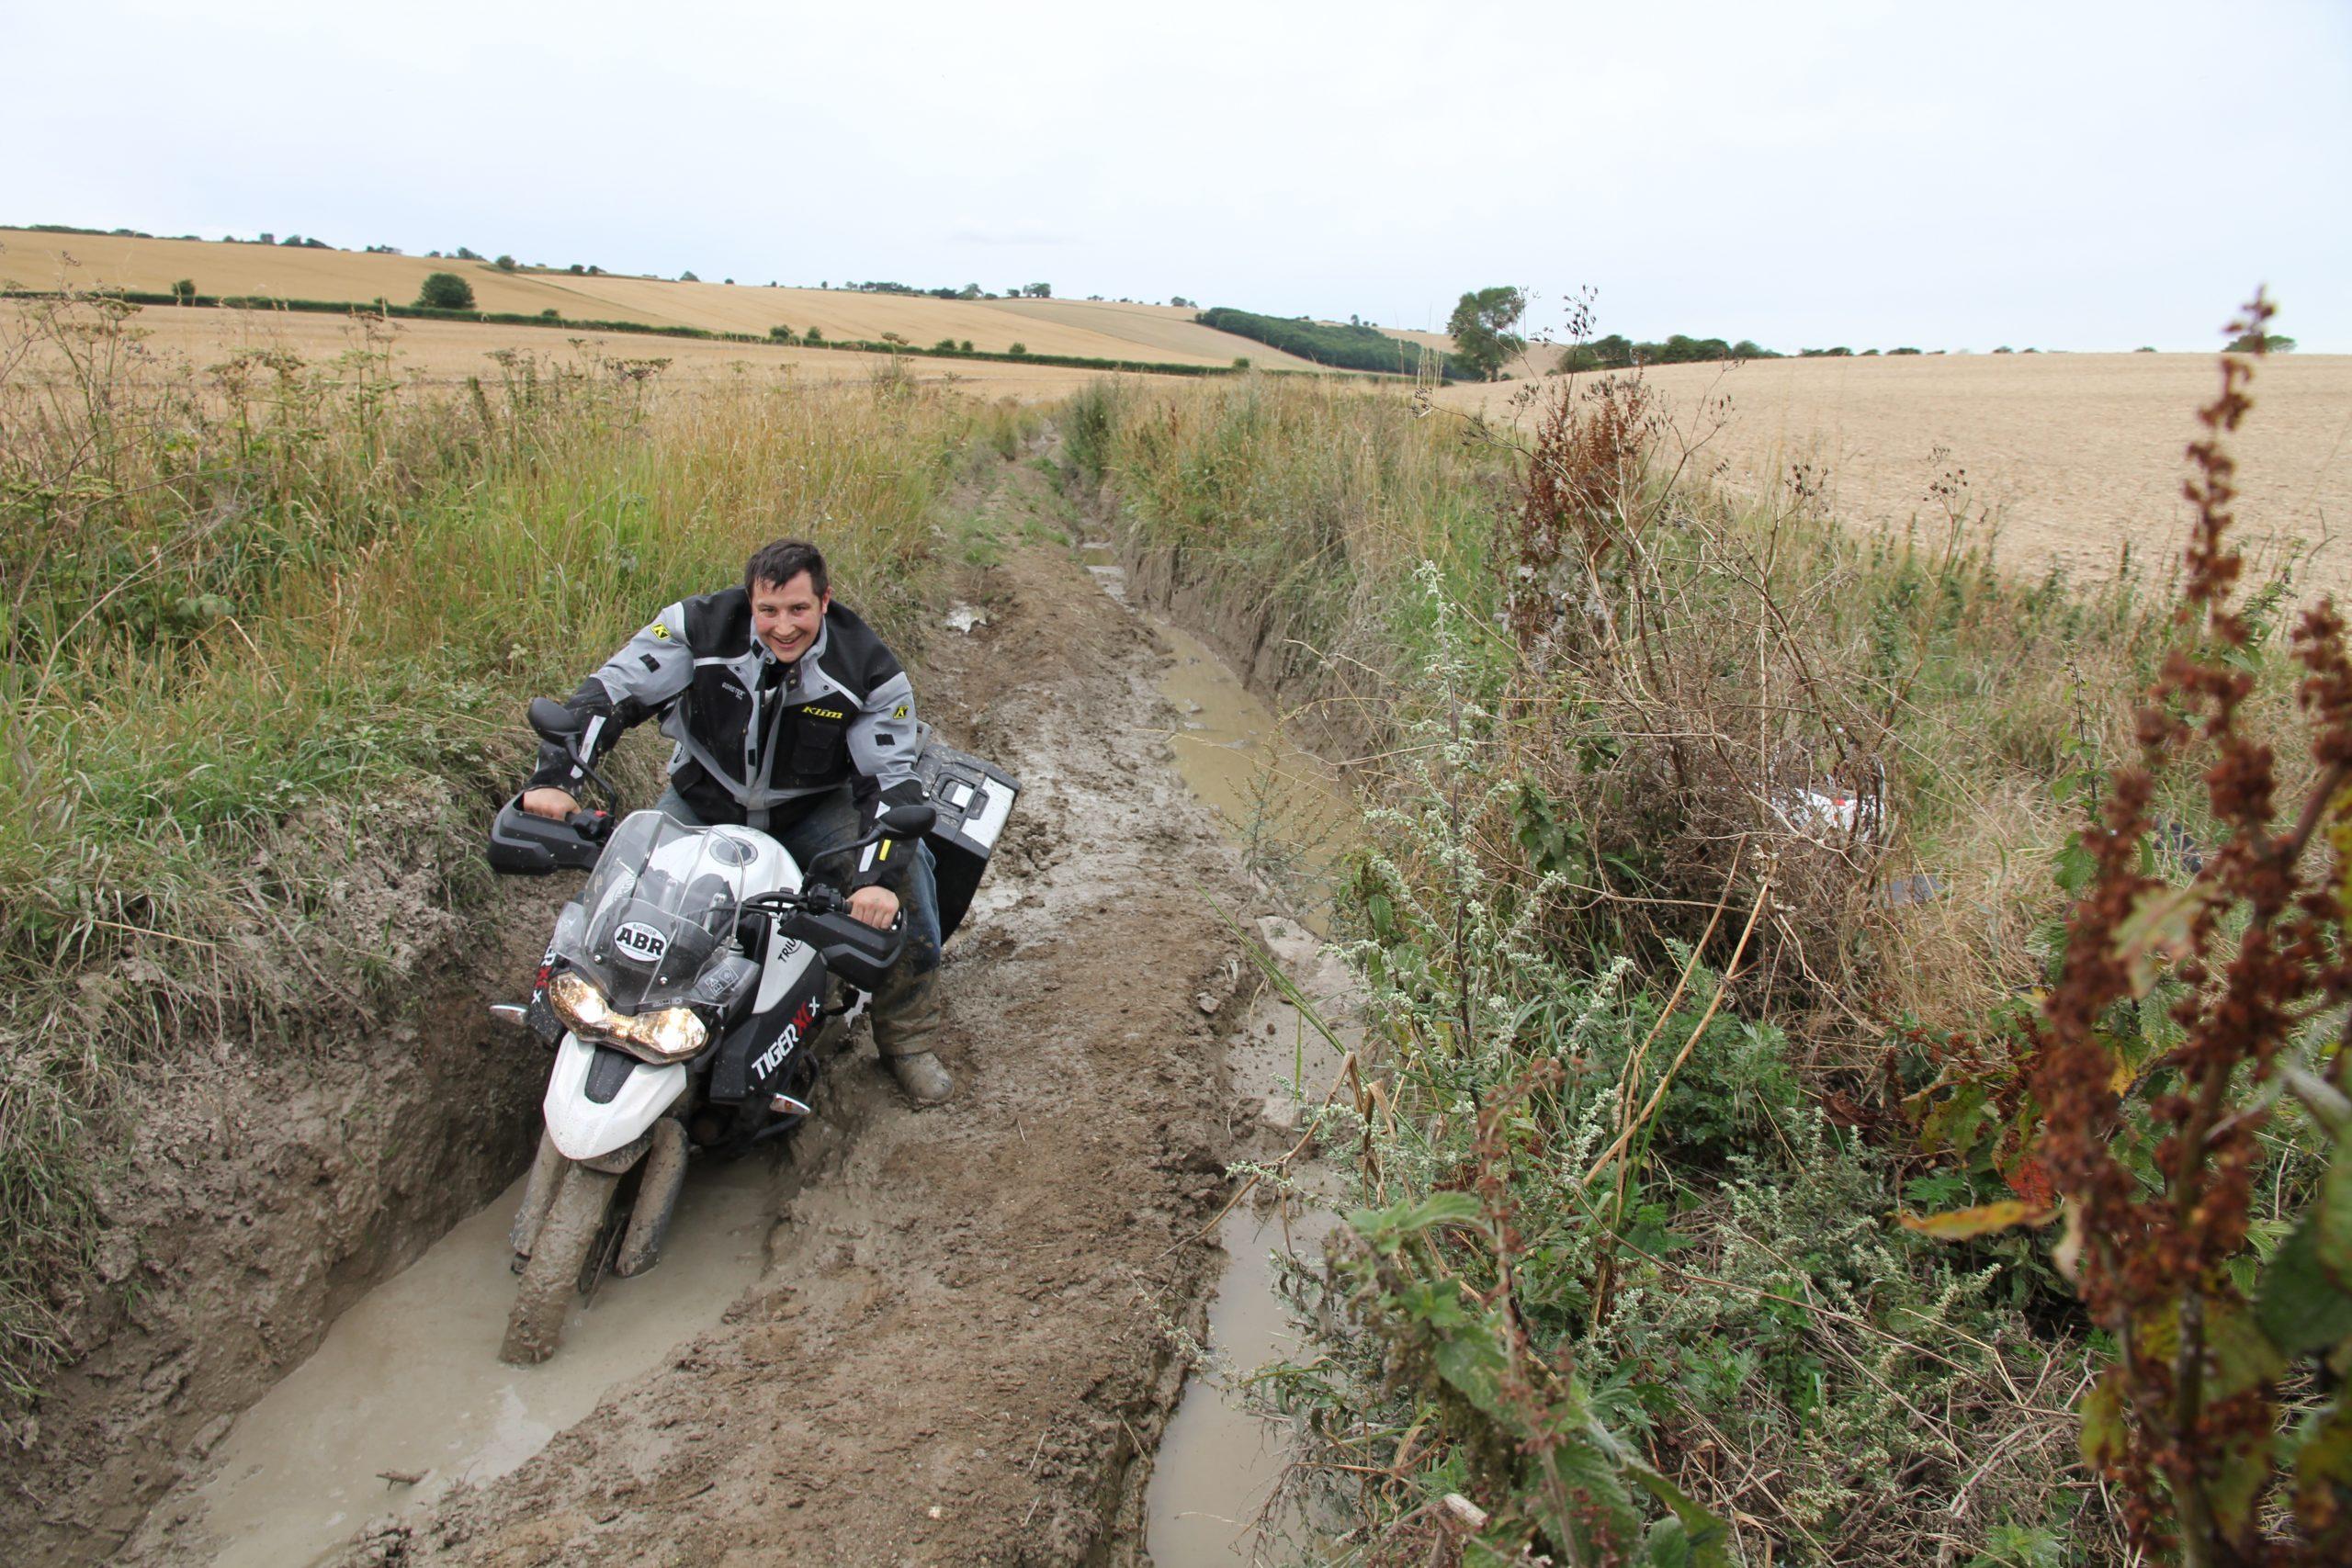 Bryn Davies editor of Adventure Bike Rider